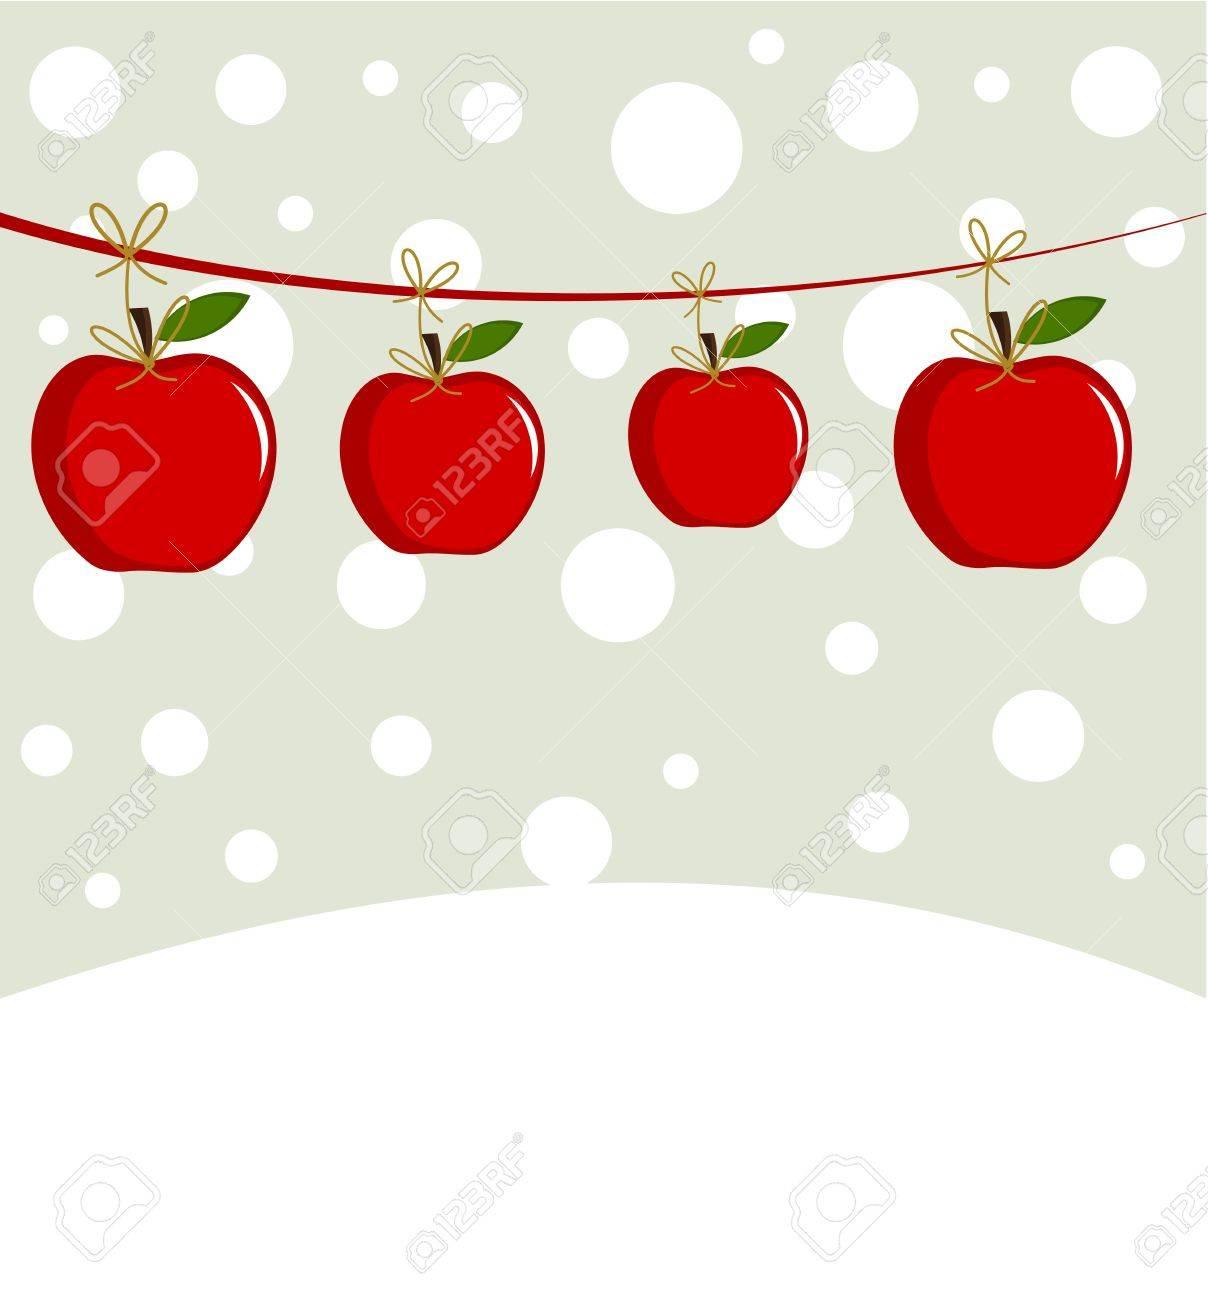 Christmas apples in winter scenery Stock Vector - 12119463